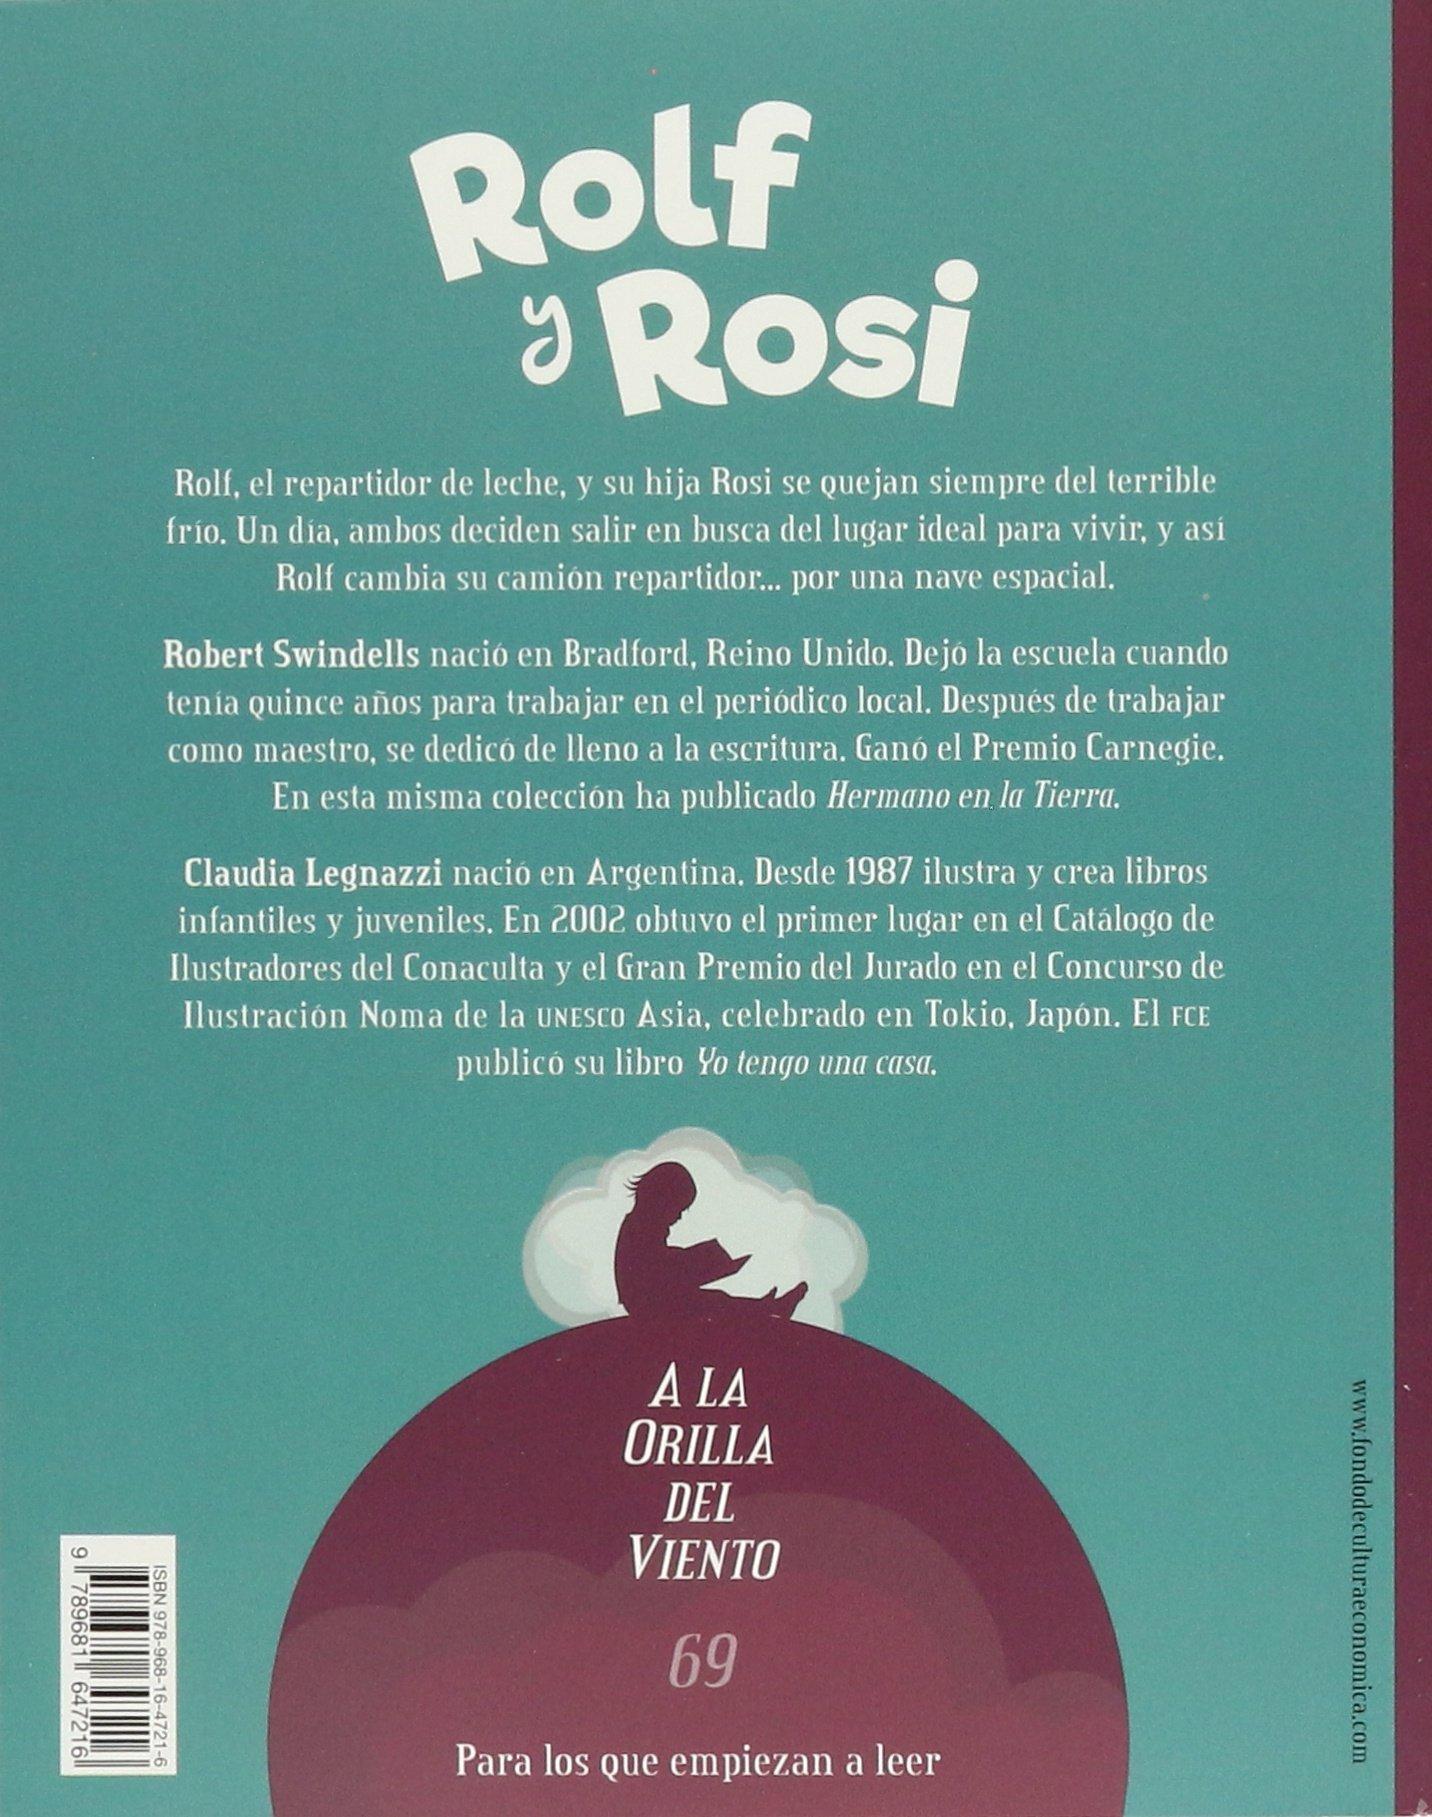 Rolf y Rosi (Spanish Edition): Swindells Robert, Claudia Legnazzi: 9789681647216: Amazon.com: Books